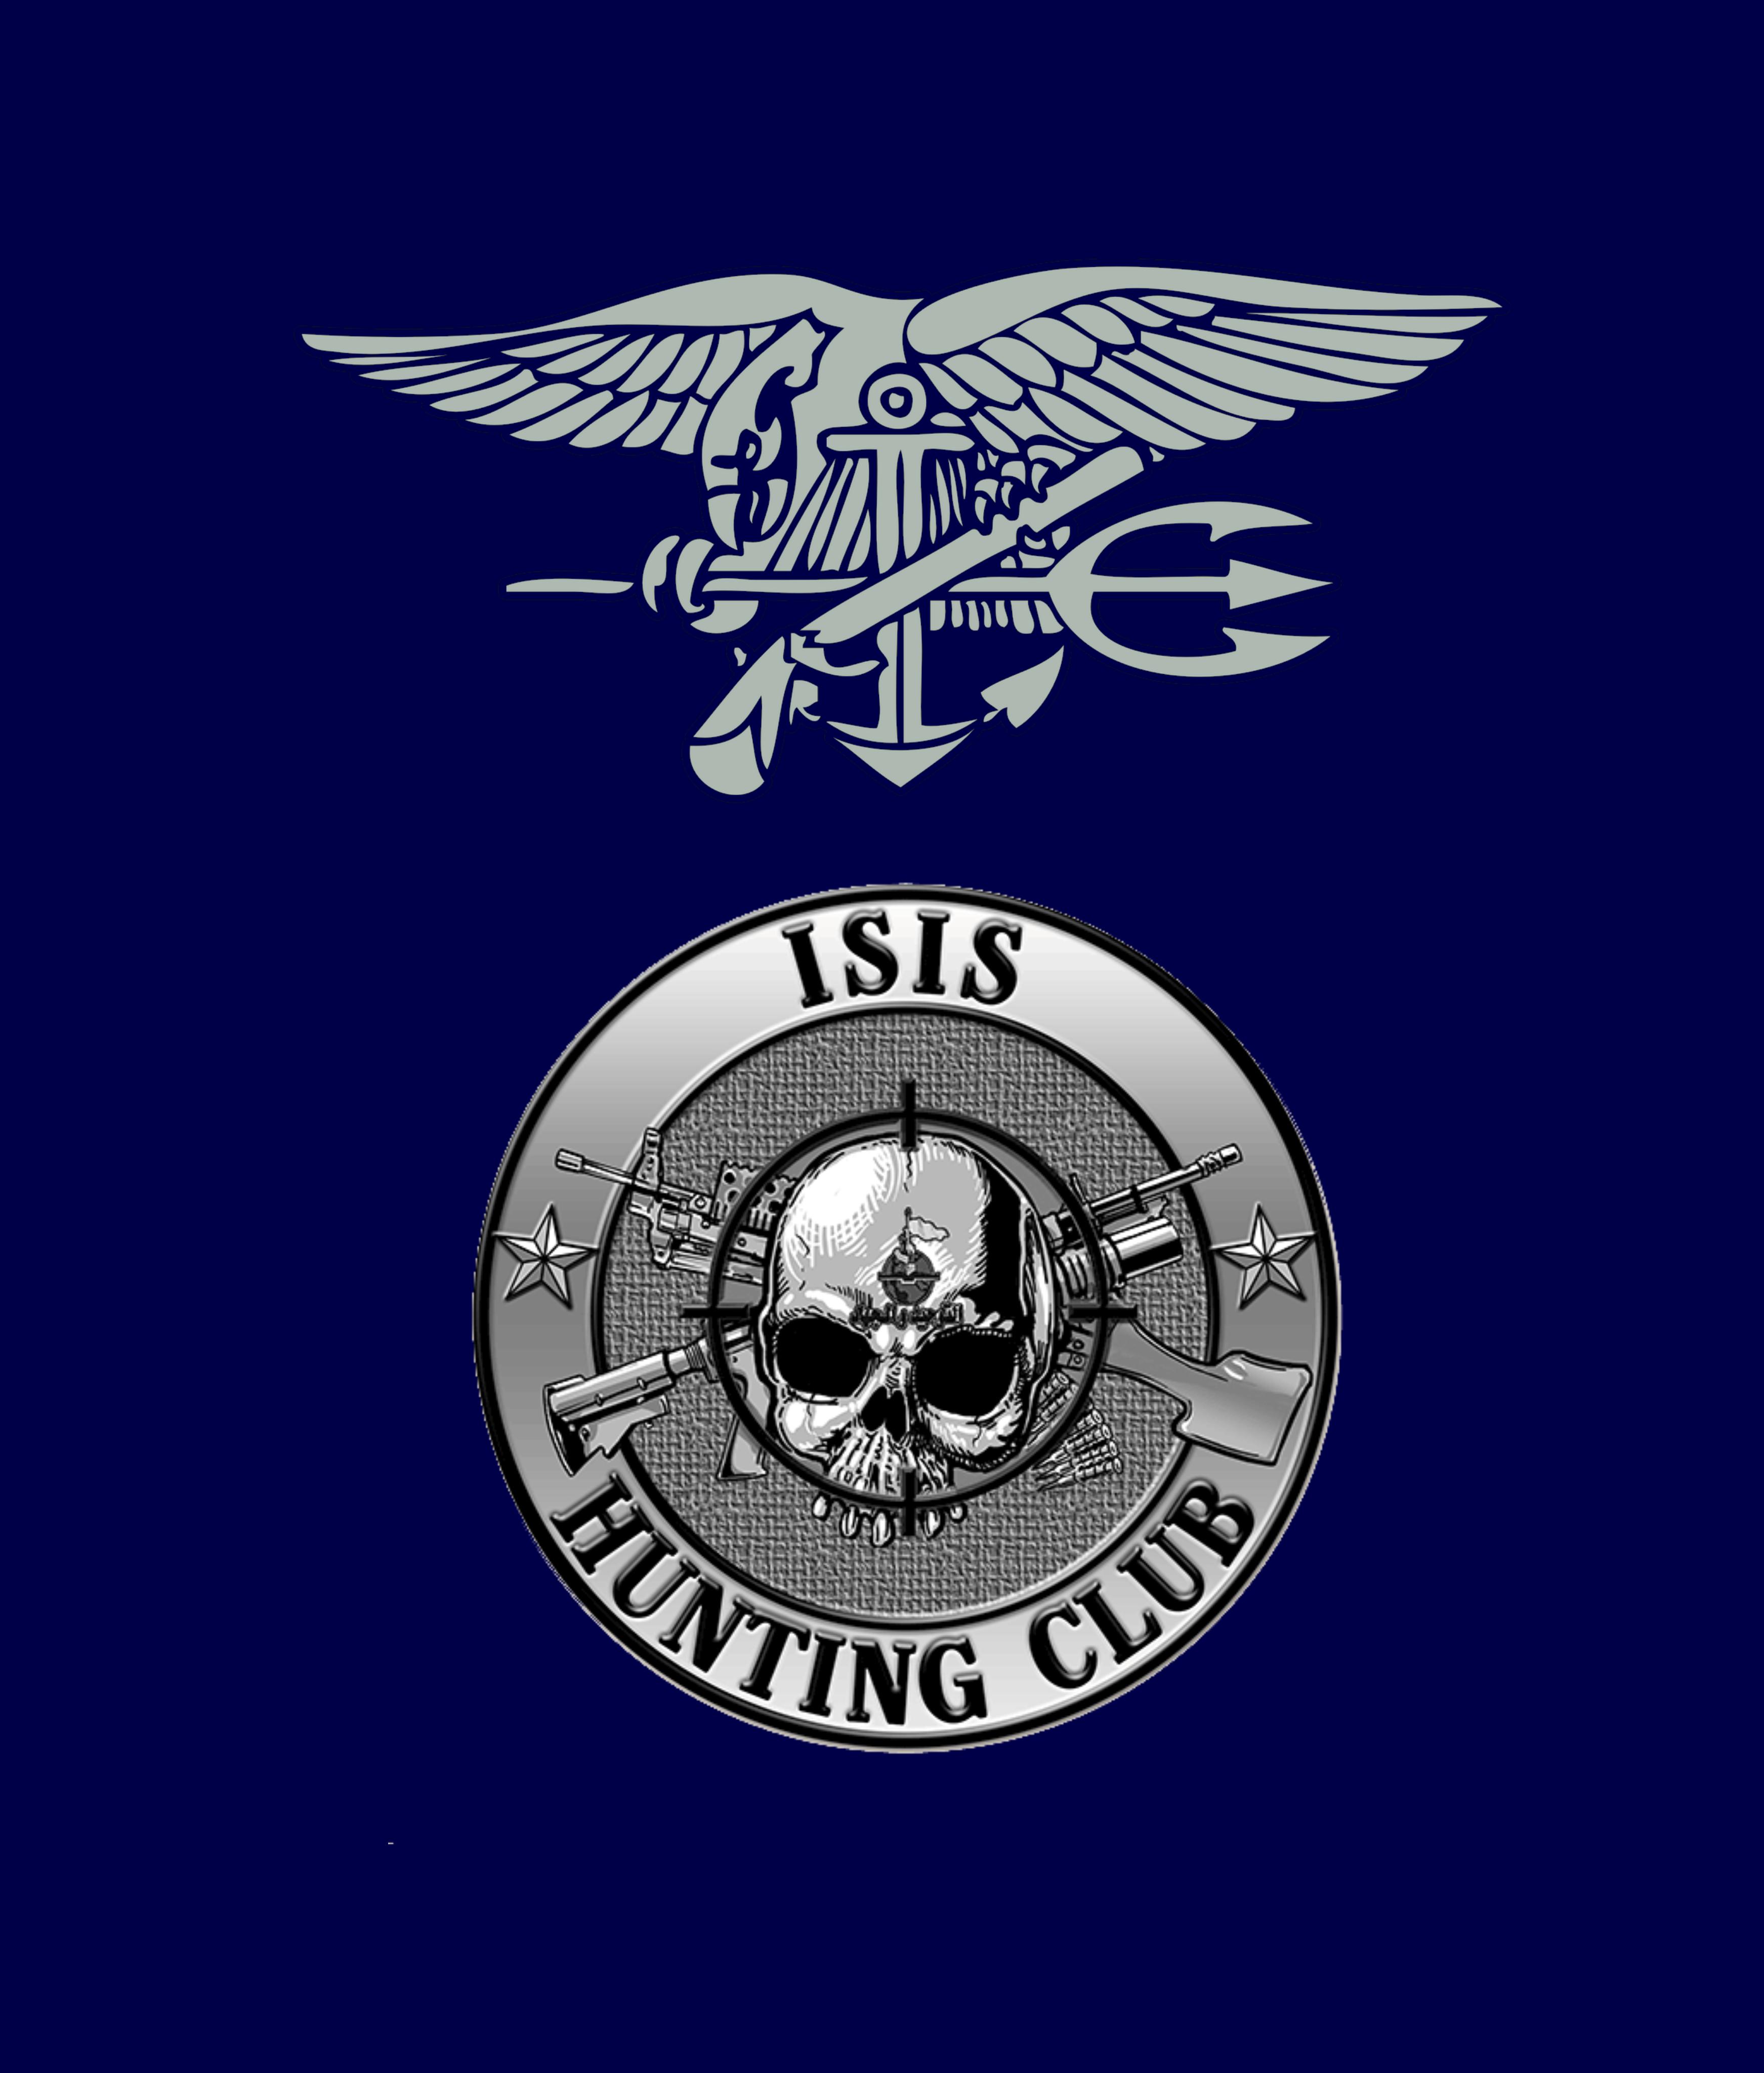 Us Navy Seals Blue Us Navy Wallpaper Army Images Navy Wallpaper